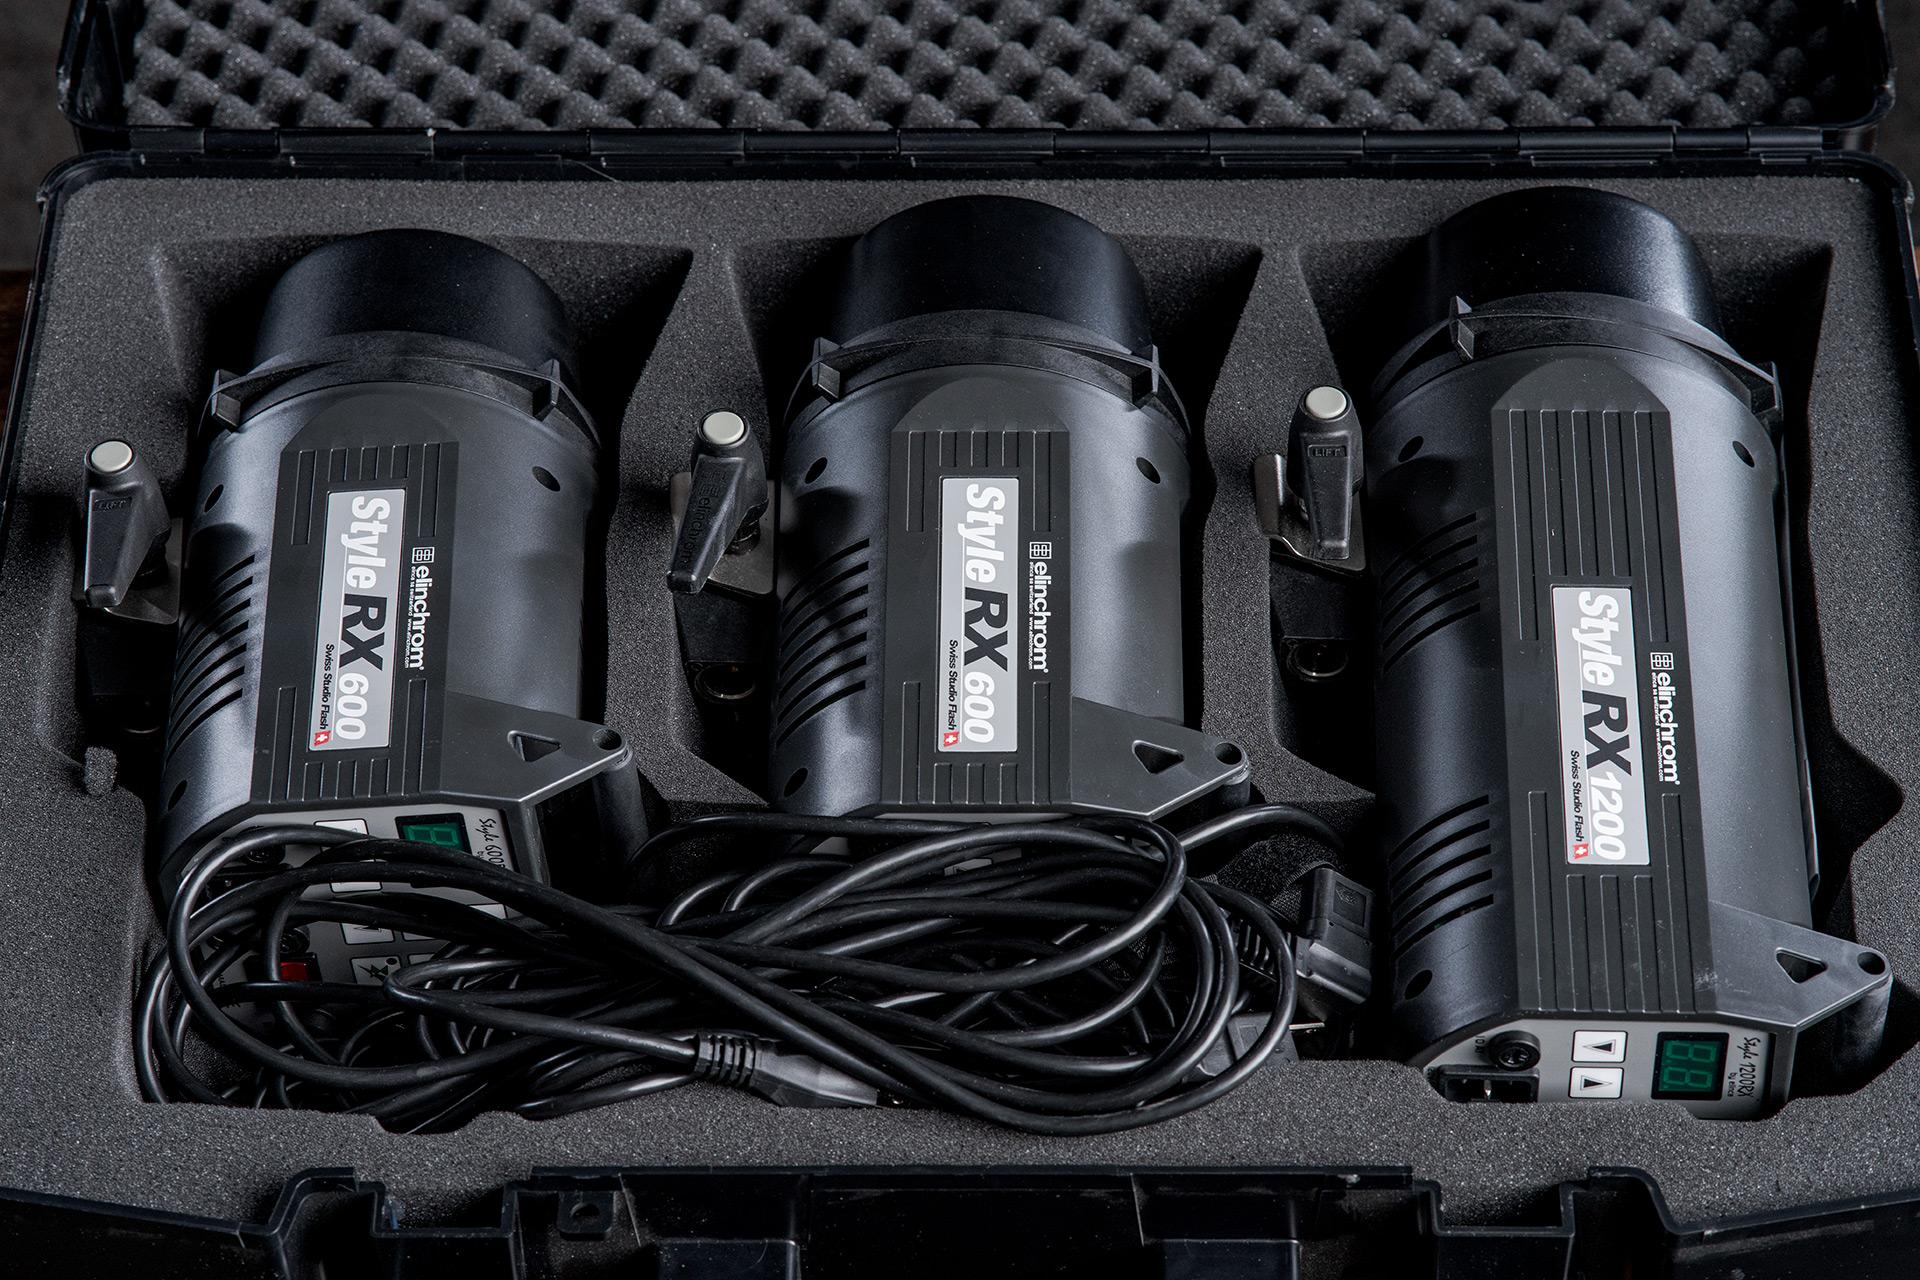 elinchrom 3 light flash strobe kit 2 style rx 600 1 style rx 1200